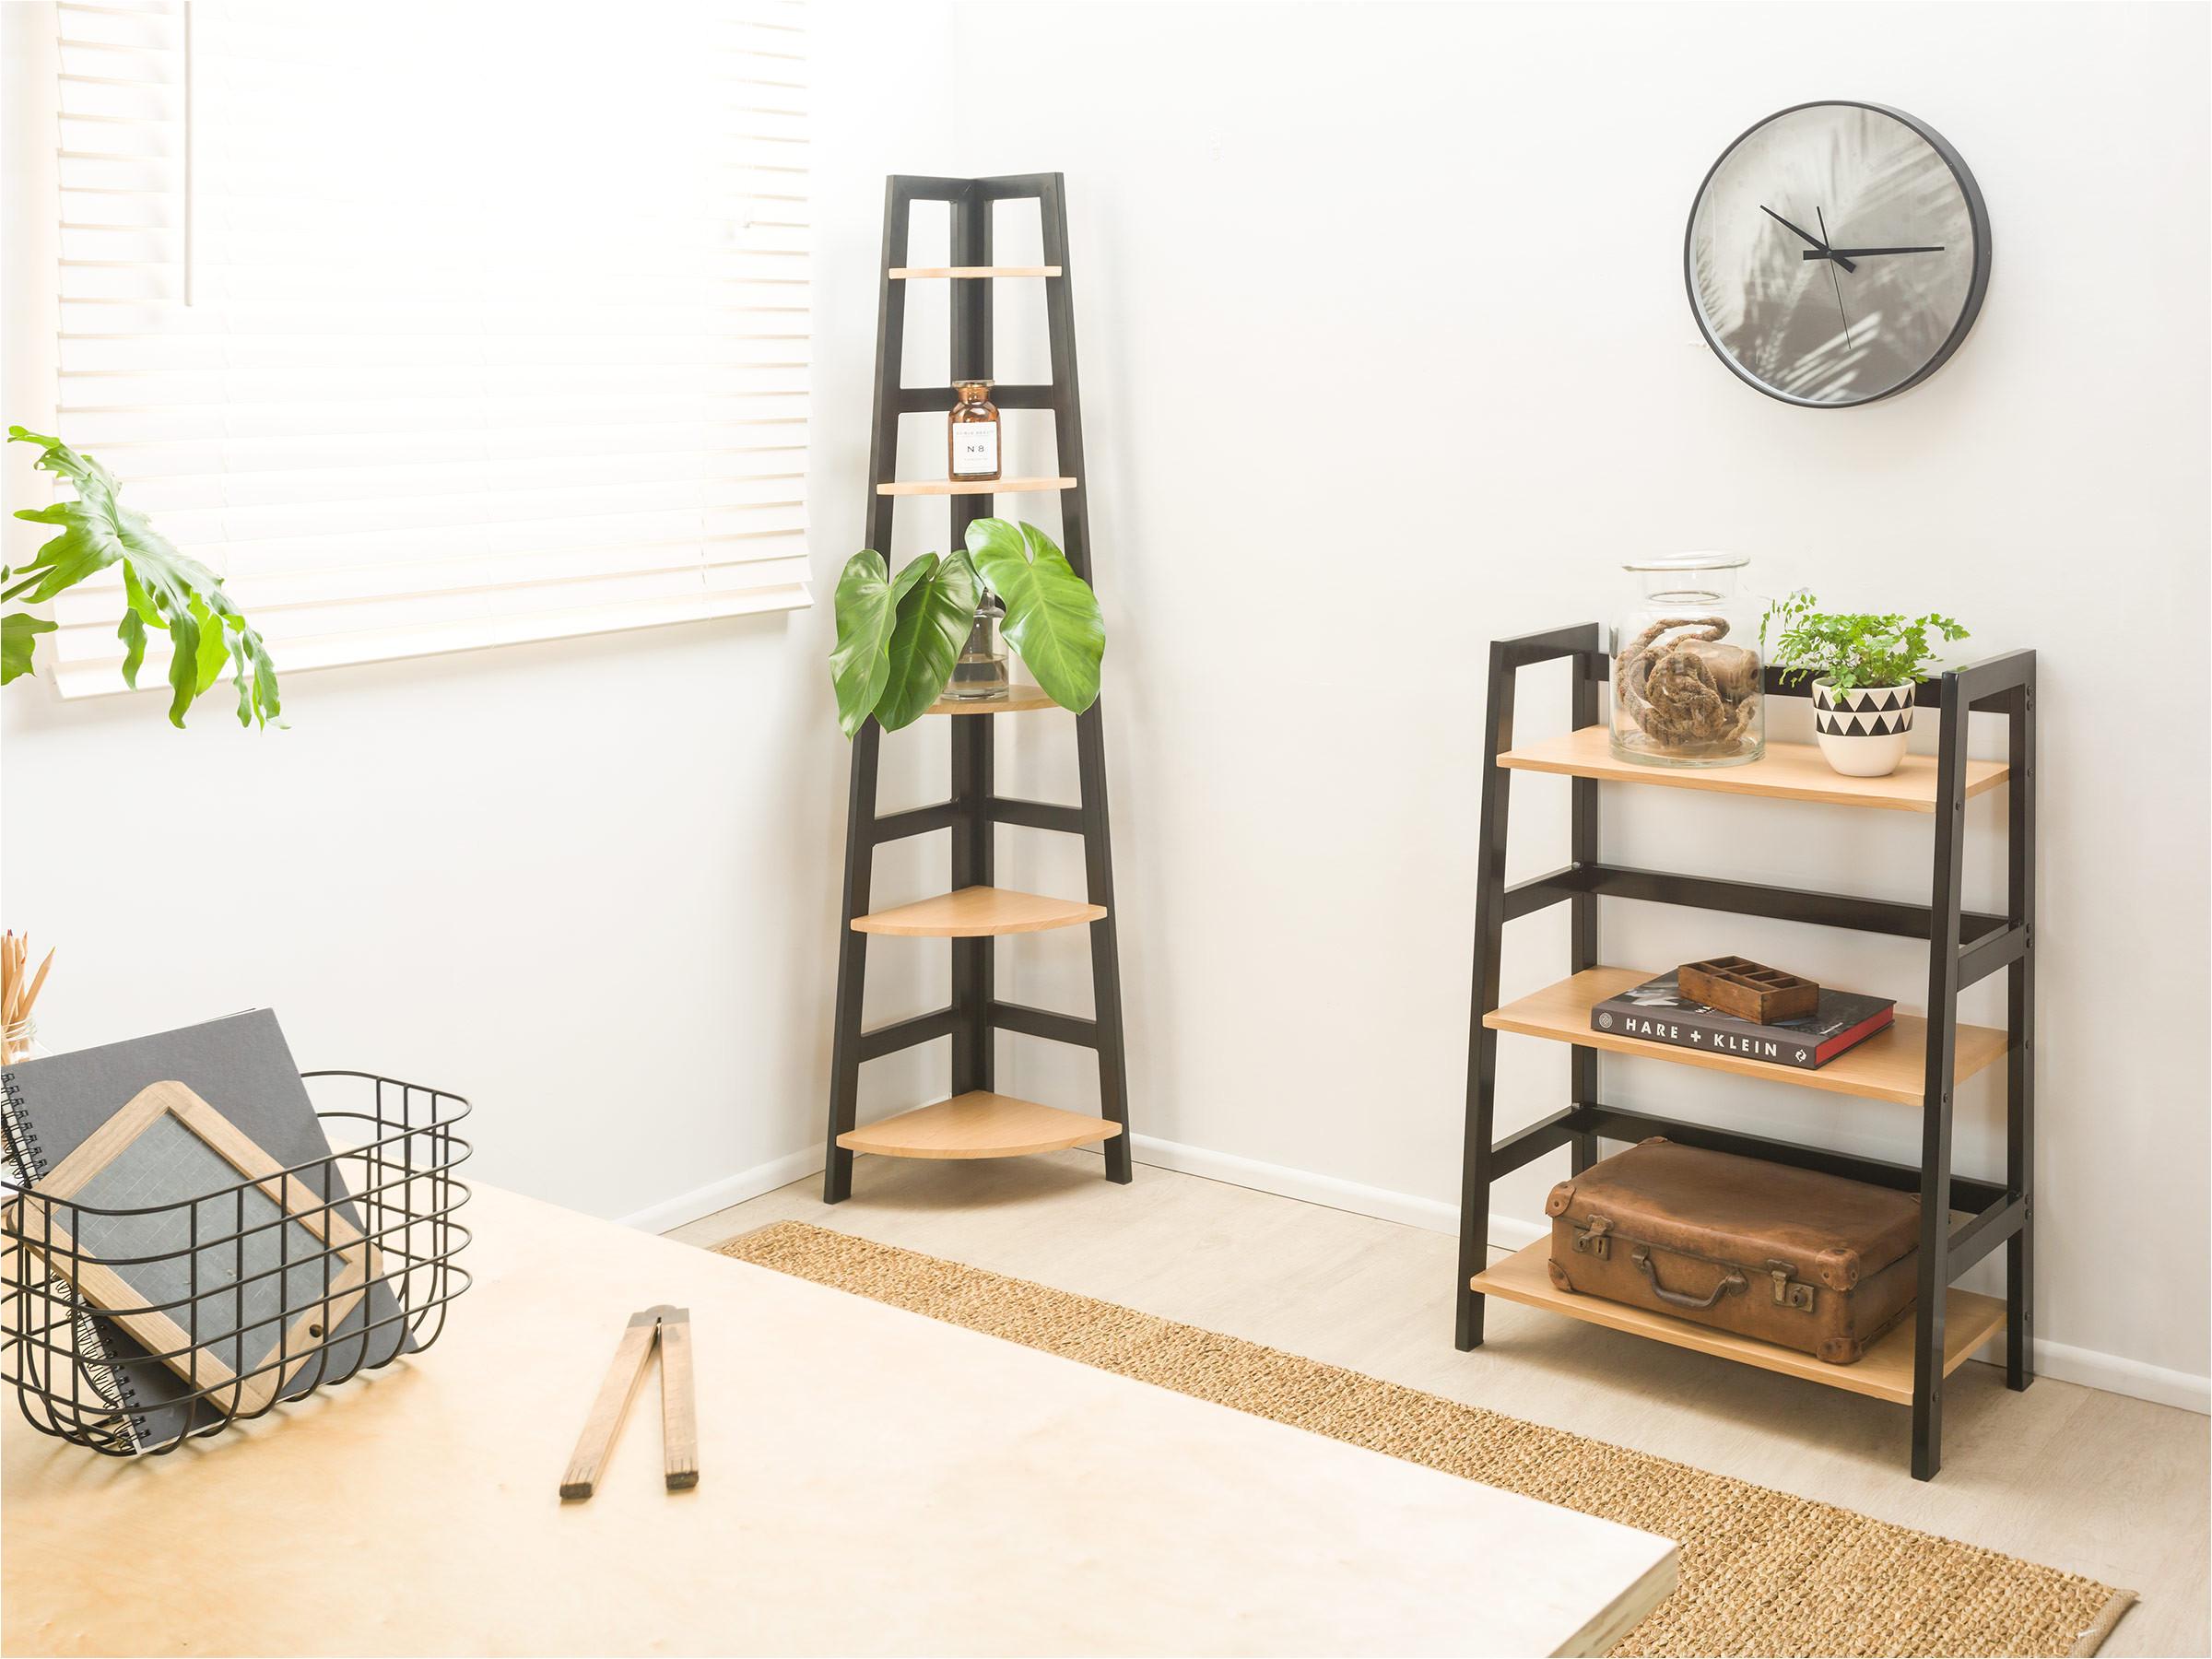 Room Essentials 5 Shelf Trestle Bookcase assembly Instructions Mocka Porto Three Shelves Shelving Units Shop now